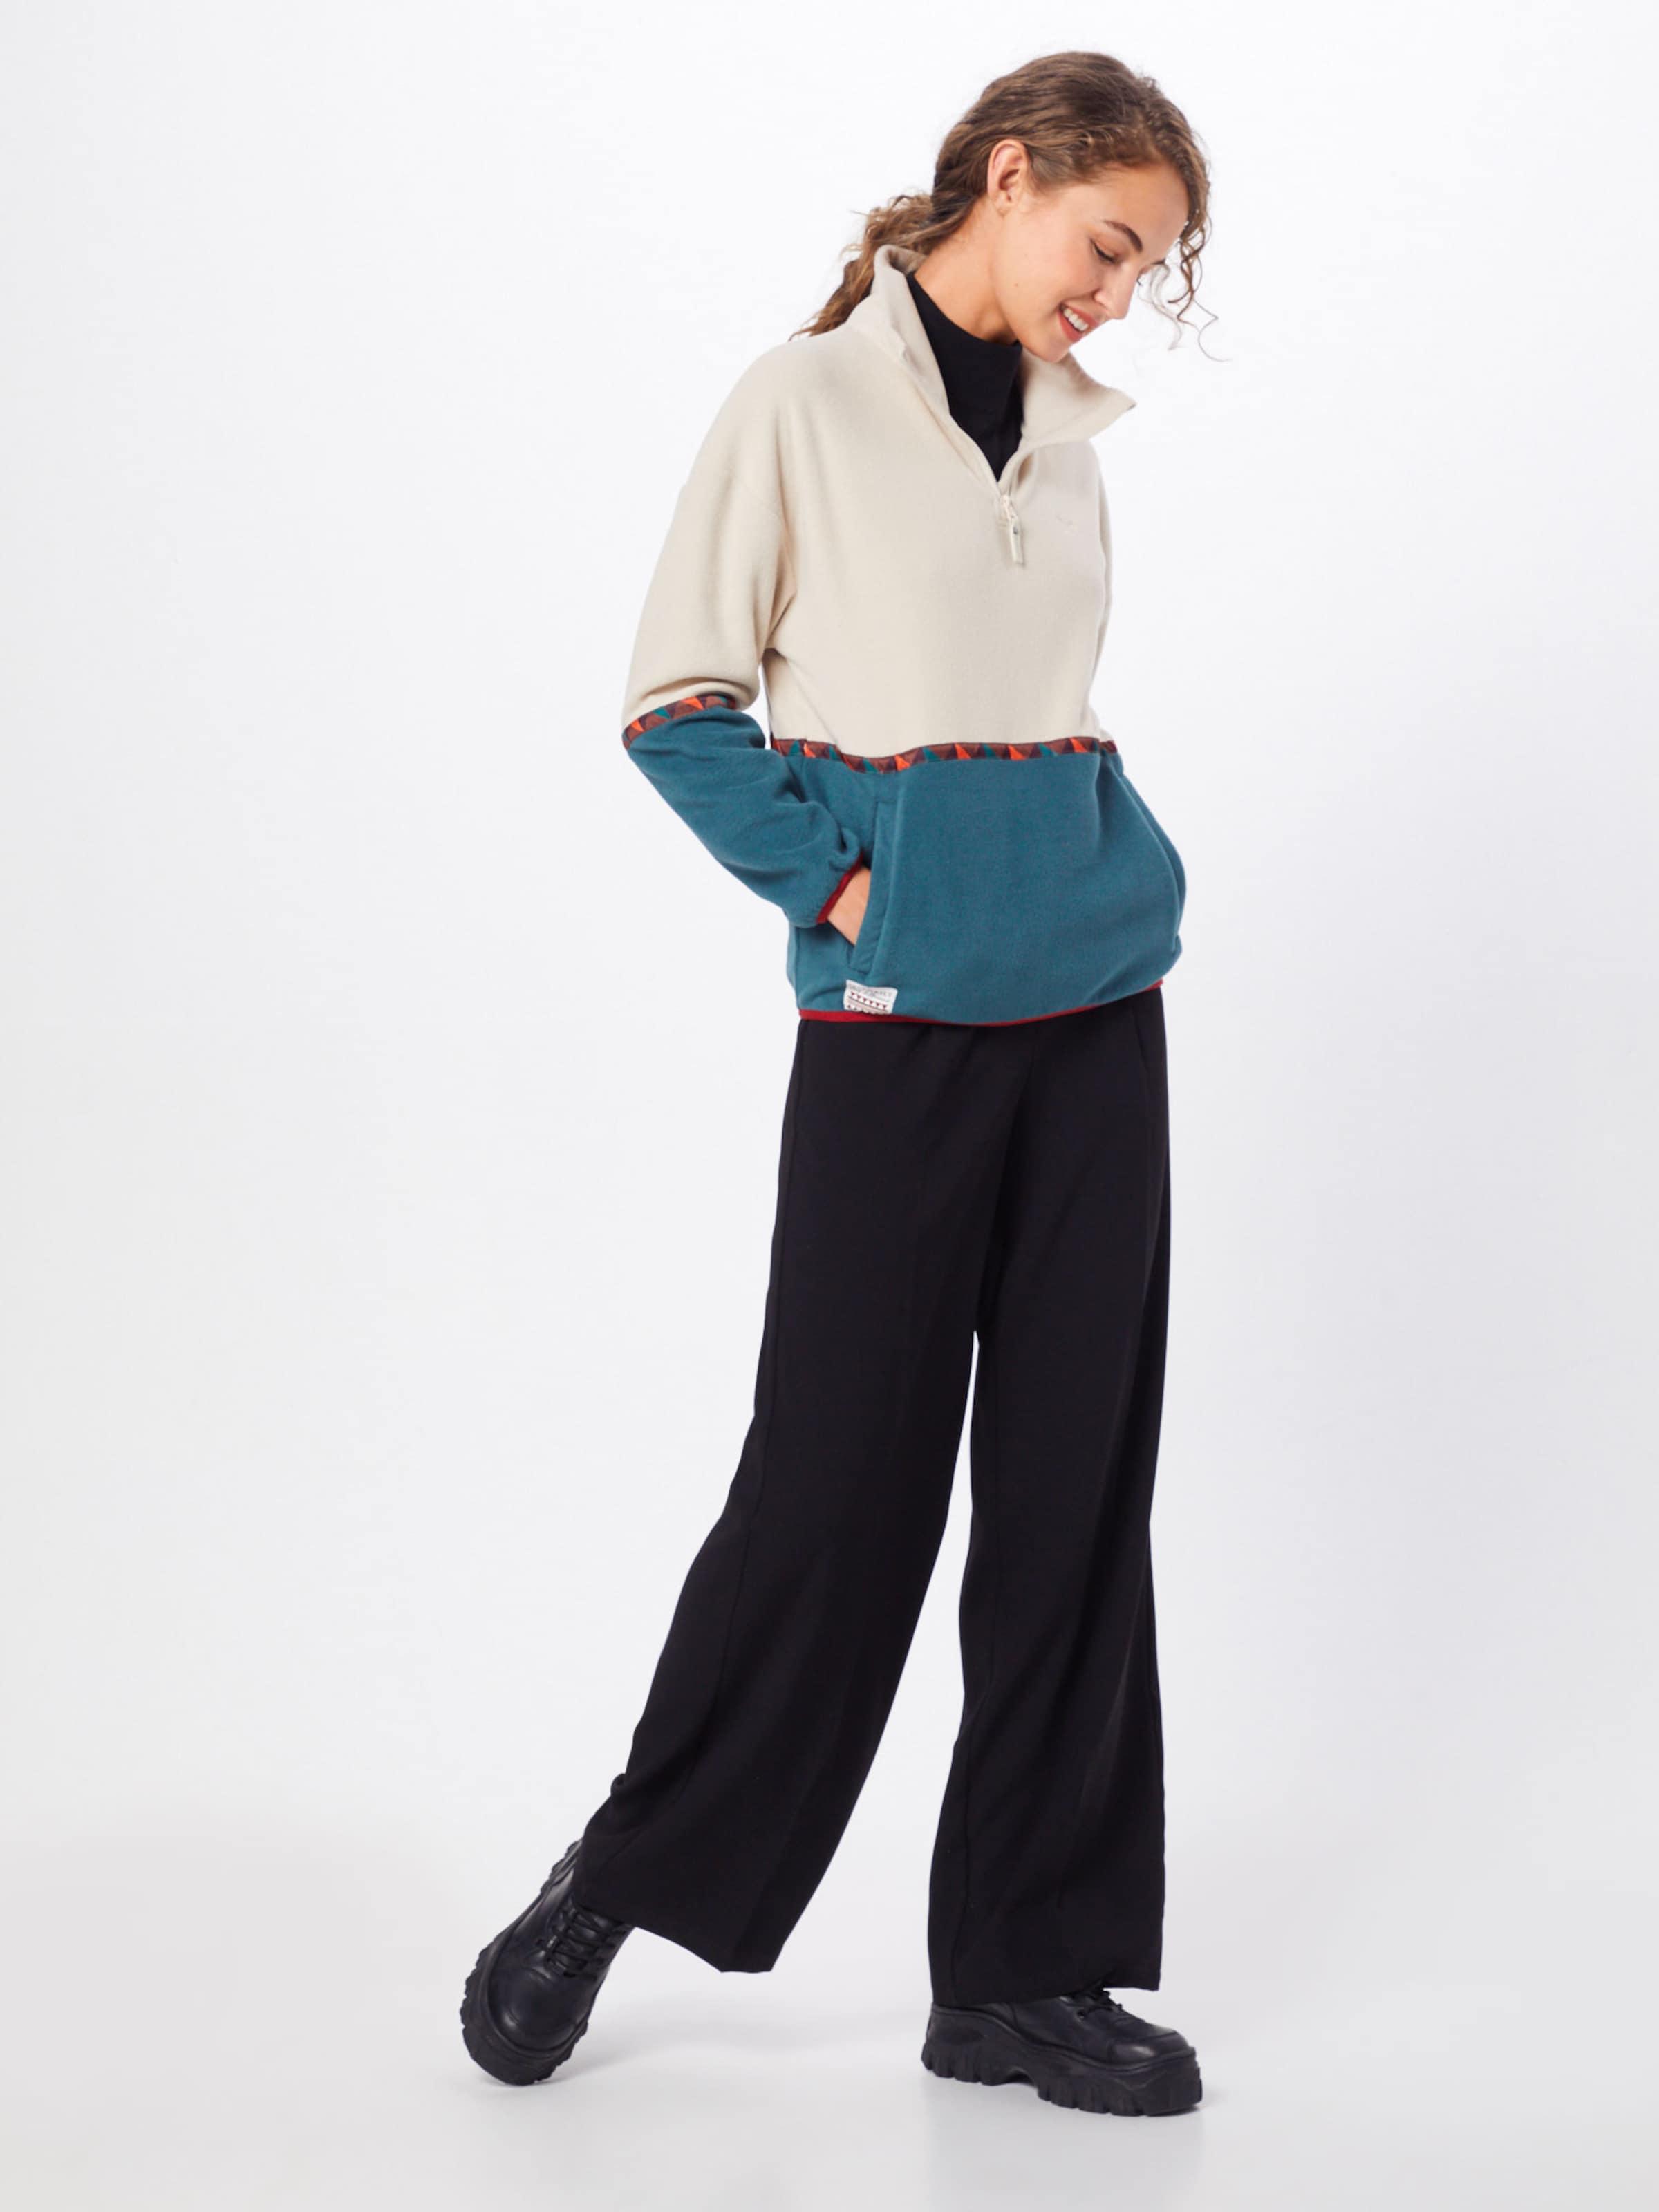 'hopi Sweatshirt Fleece Troyer' PetrolOffwhite In Iriedaily mwN80nv